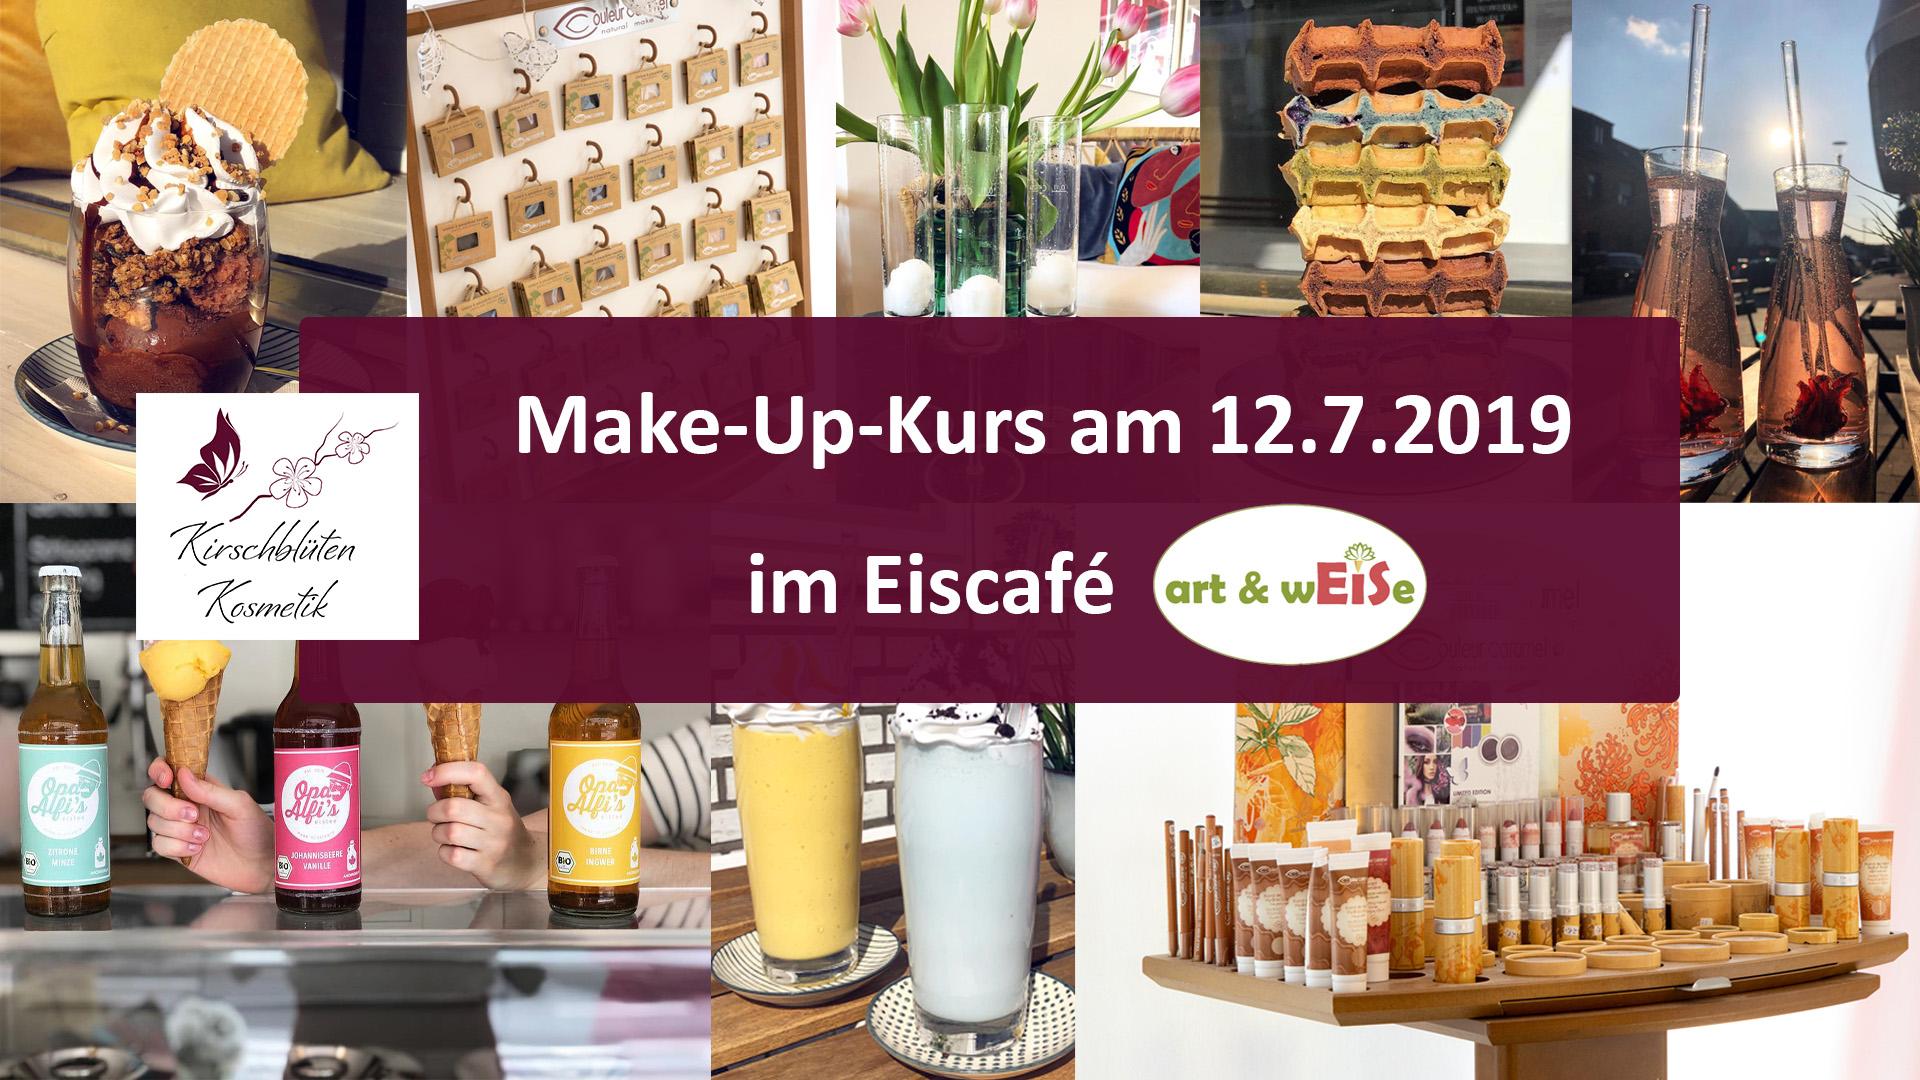 Make-Up-Kurs im Eiscafé art & wEISe